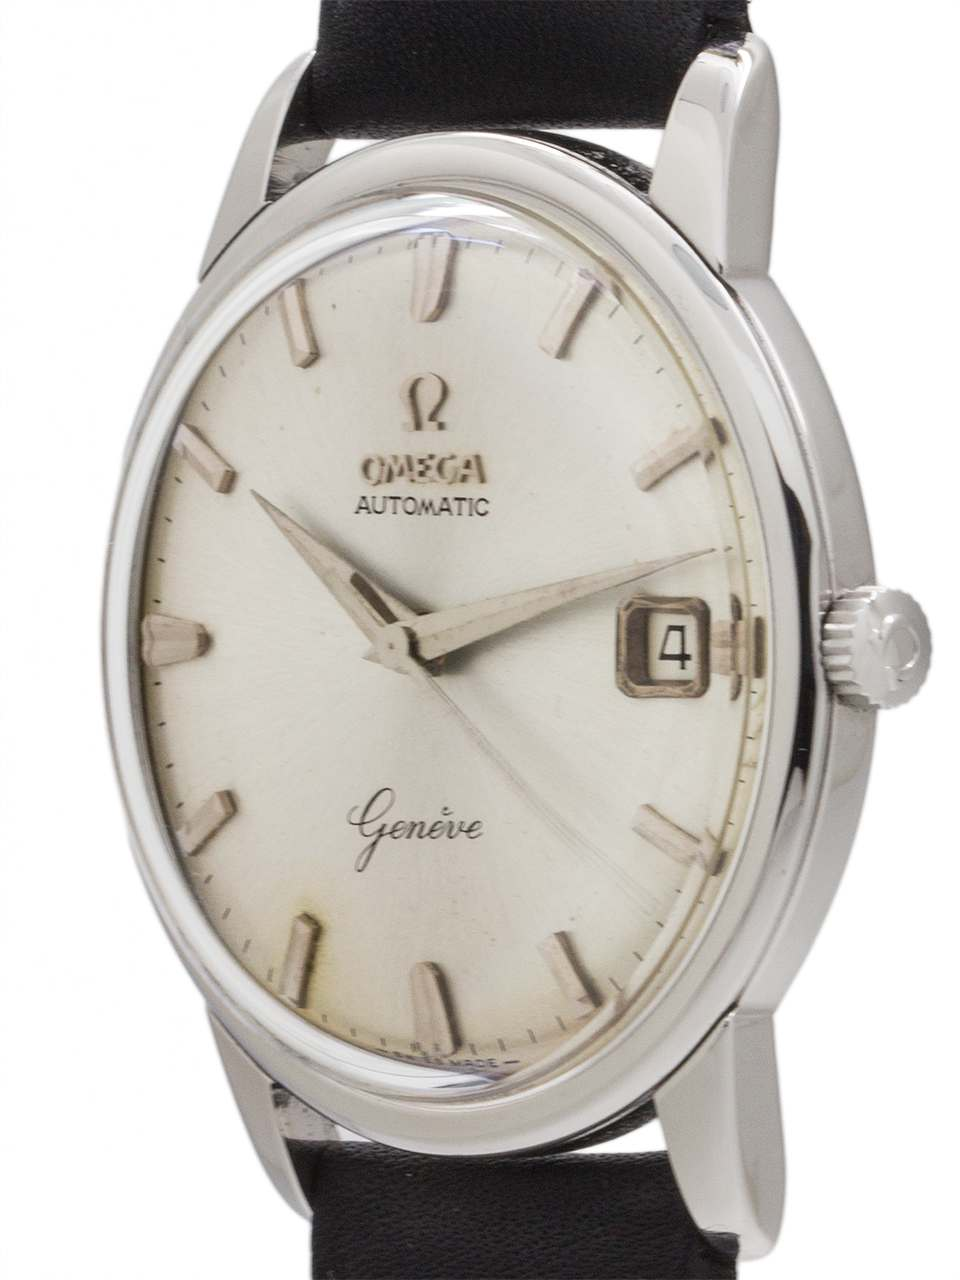 Omega Automatic Geneve ref 14703 circa 1961